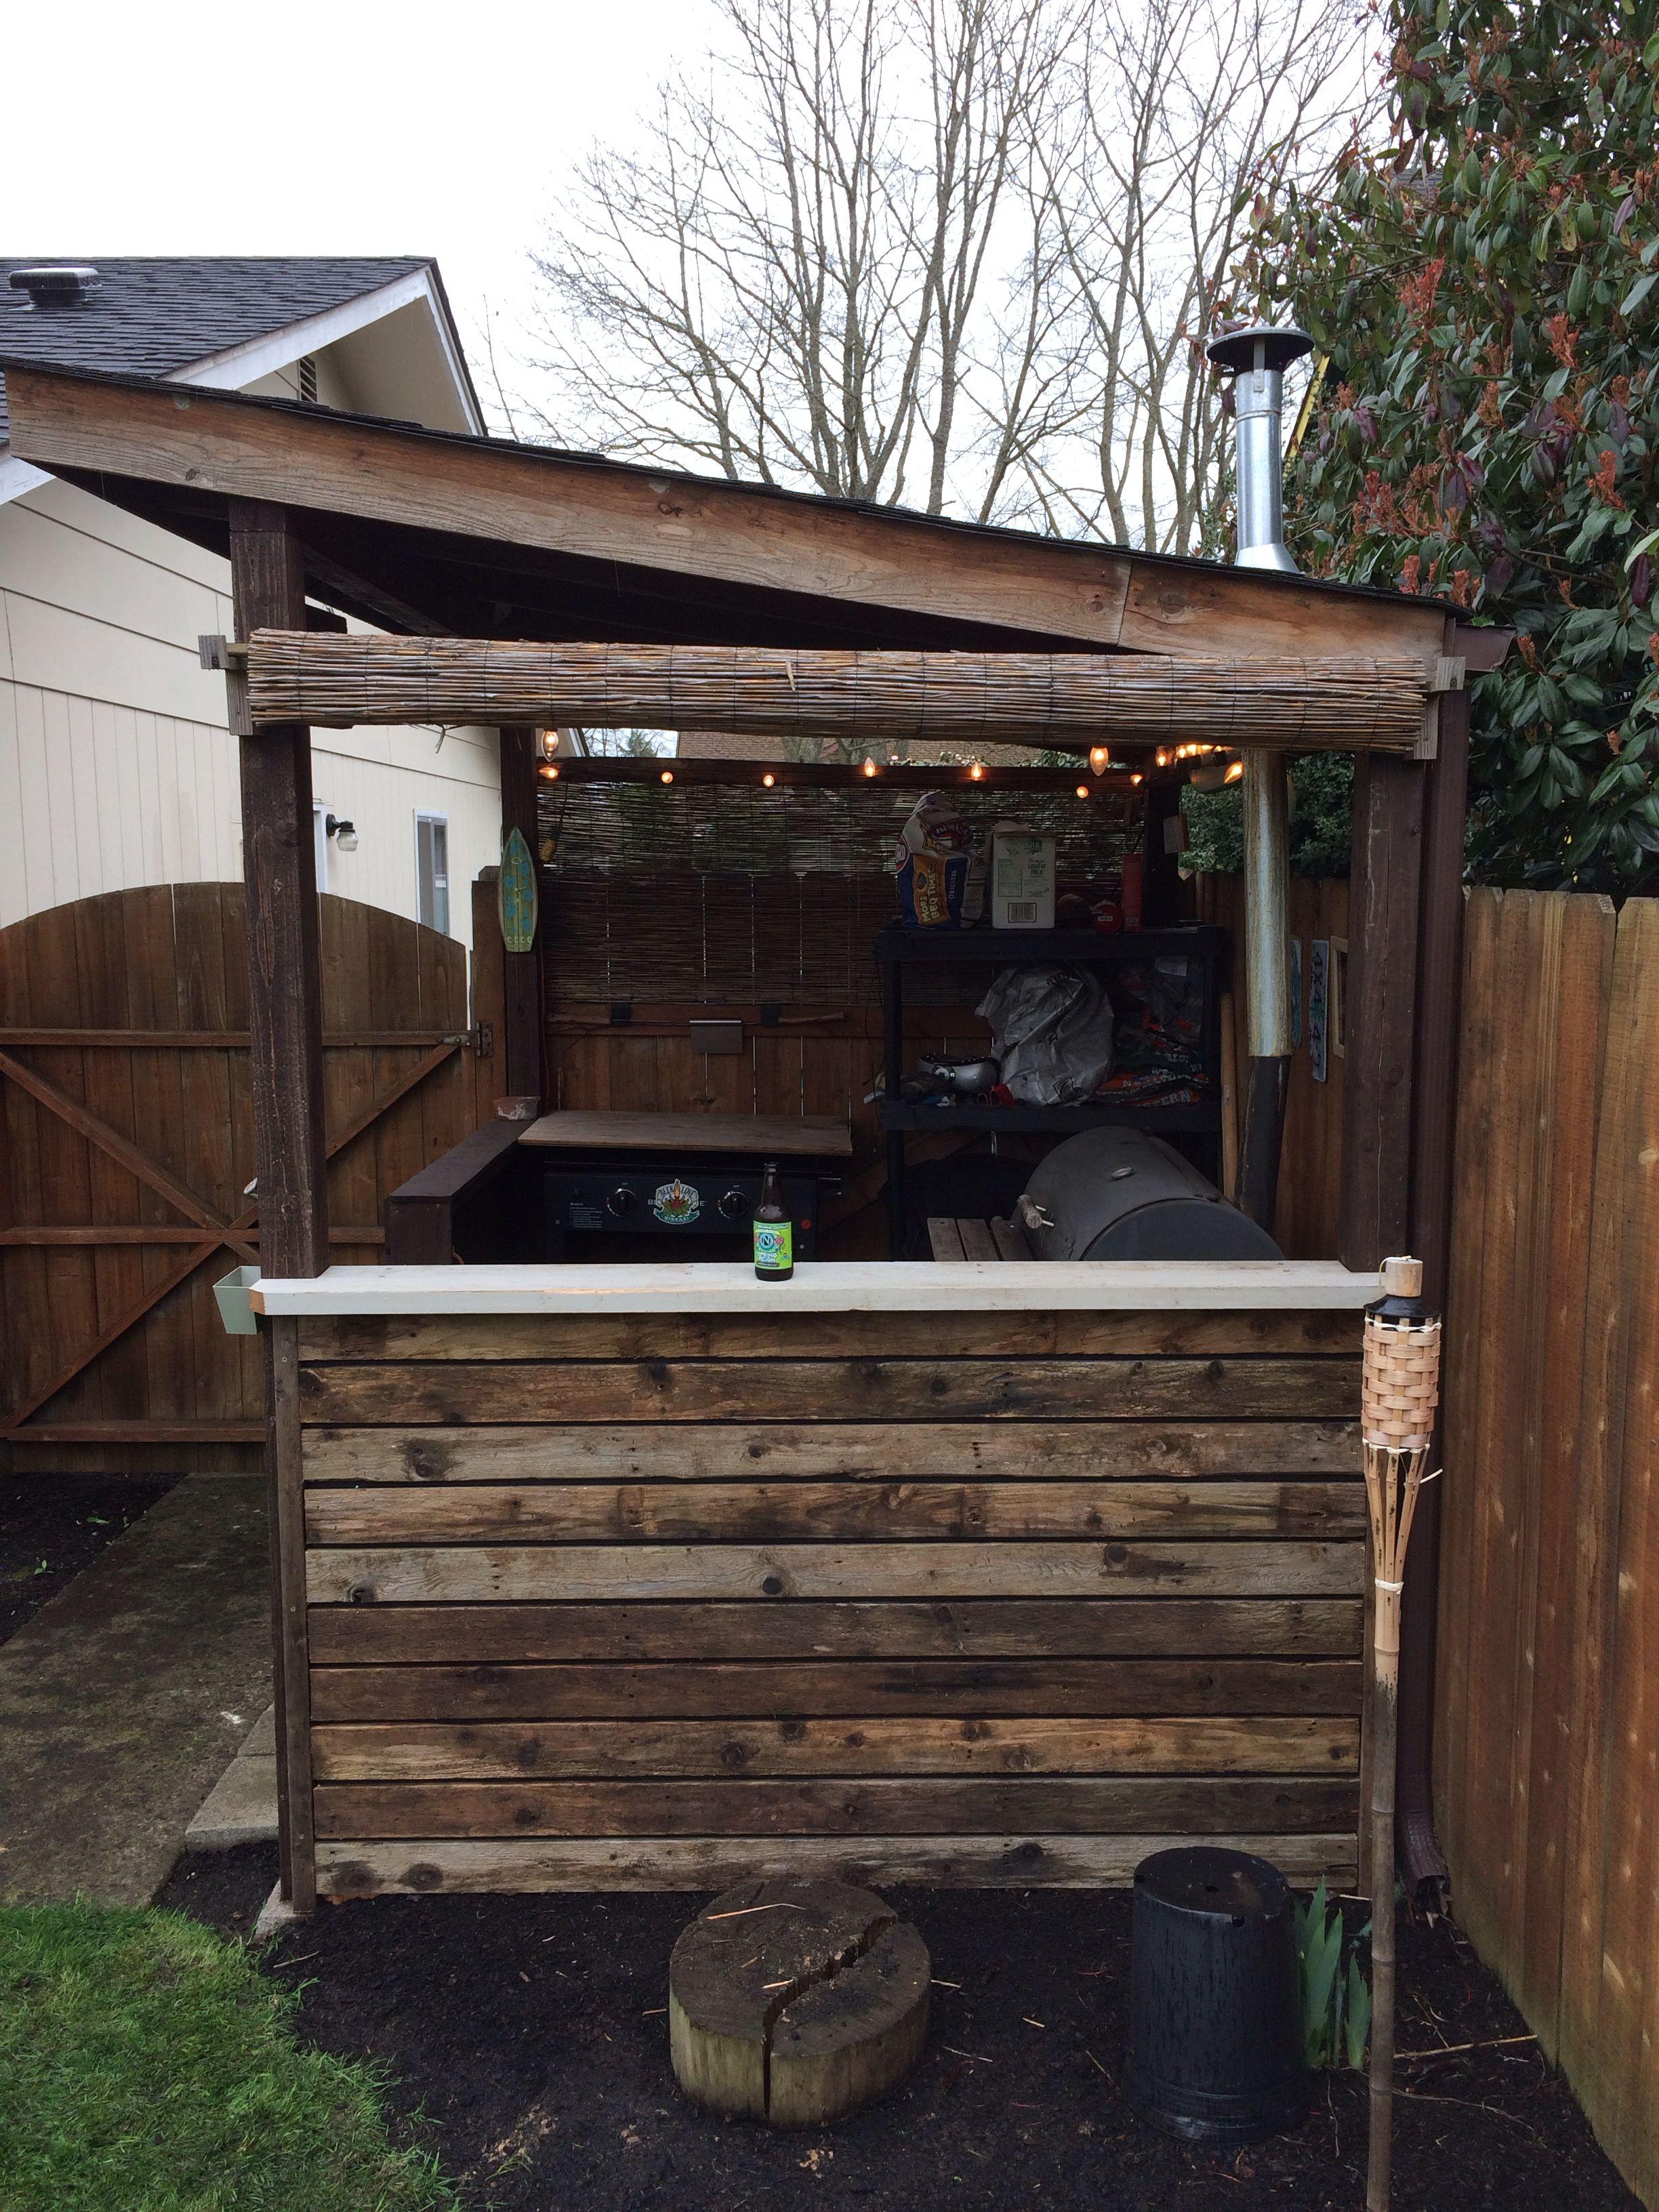 Fine Woodworking Supplies Bbq Shed Outdoor Outdoor Kitchen Sink